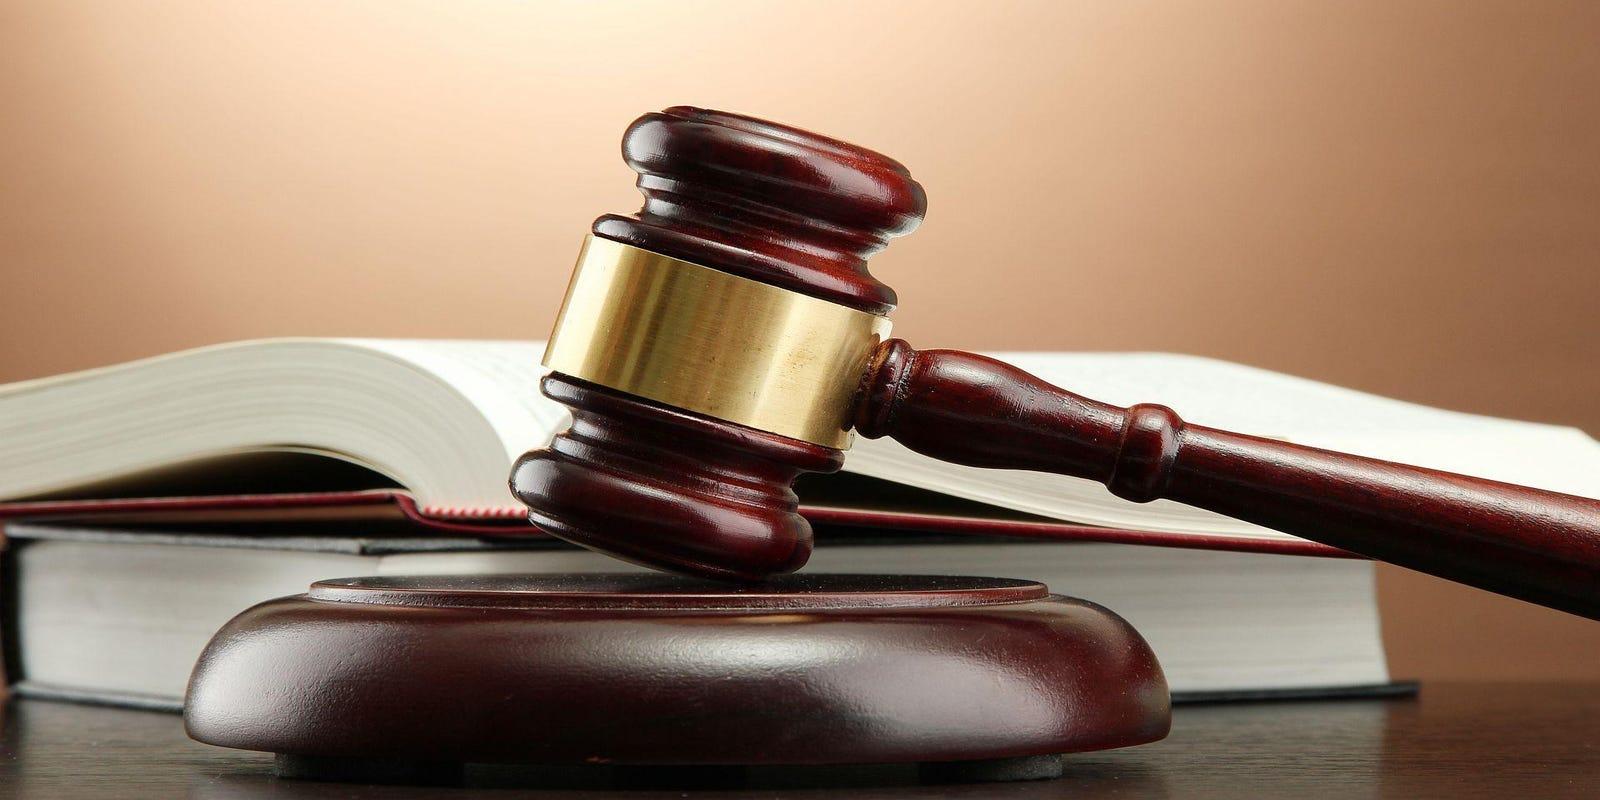 Ex-Catholic school teacher pleads guilty in sex abuse cases